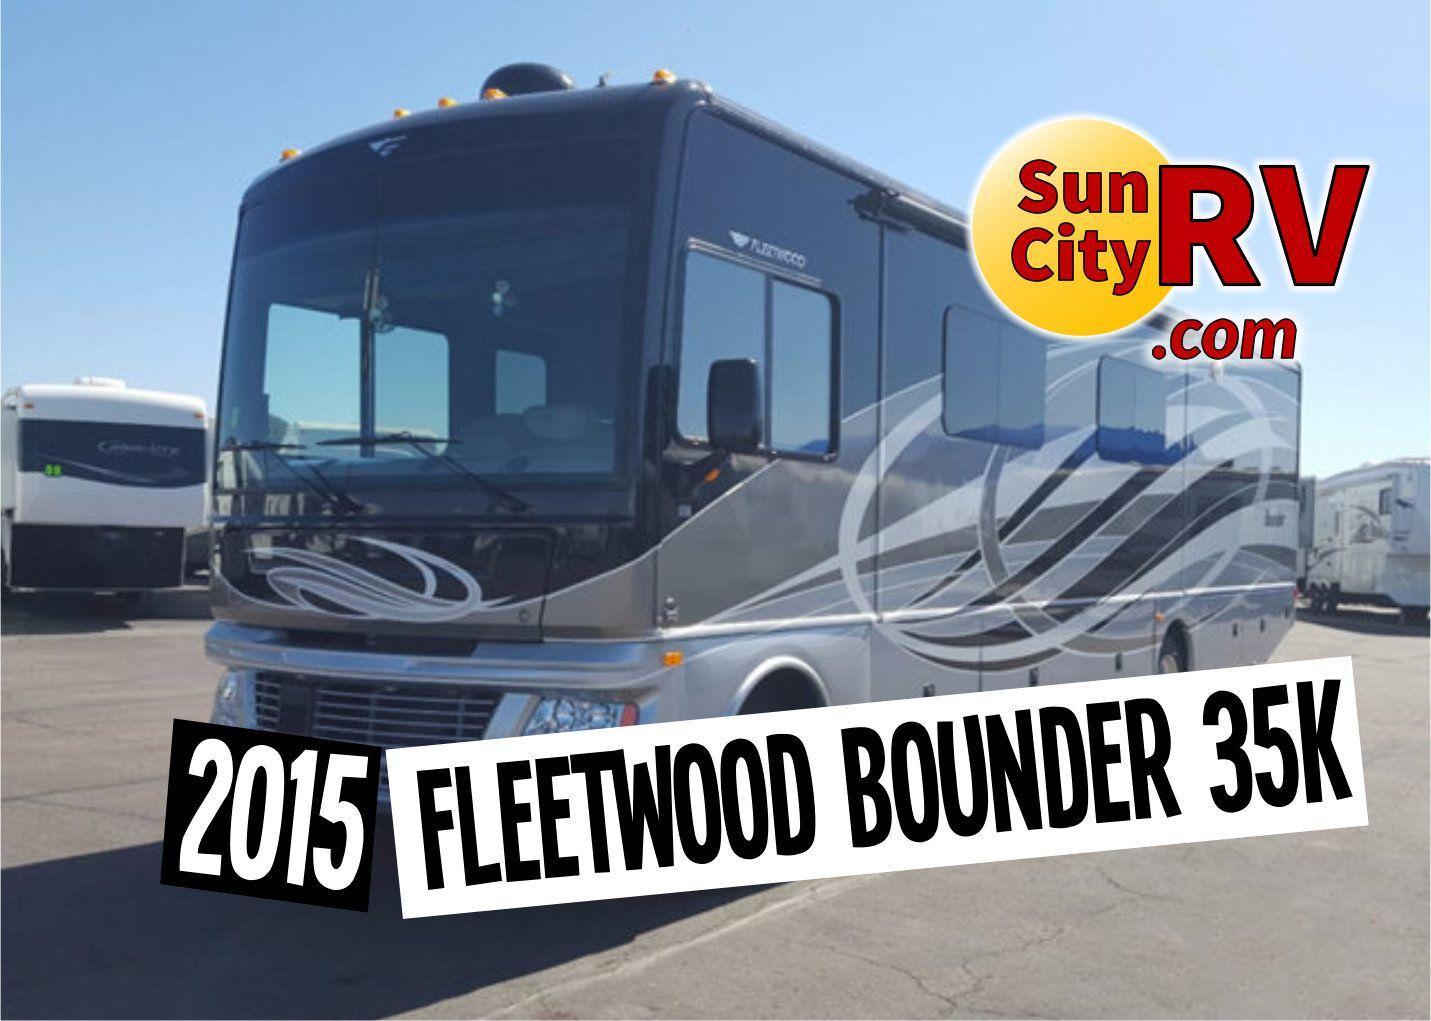 This Gorgeous 2015 Fleetwood Bounder 35k Has Granite Countertops